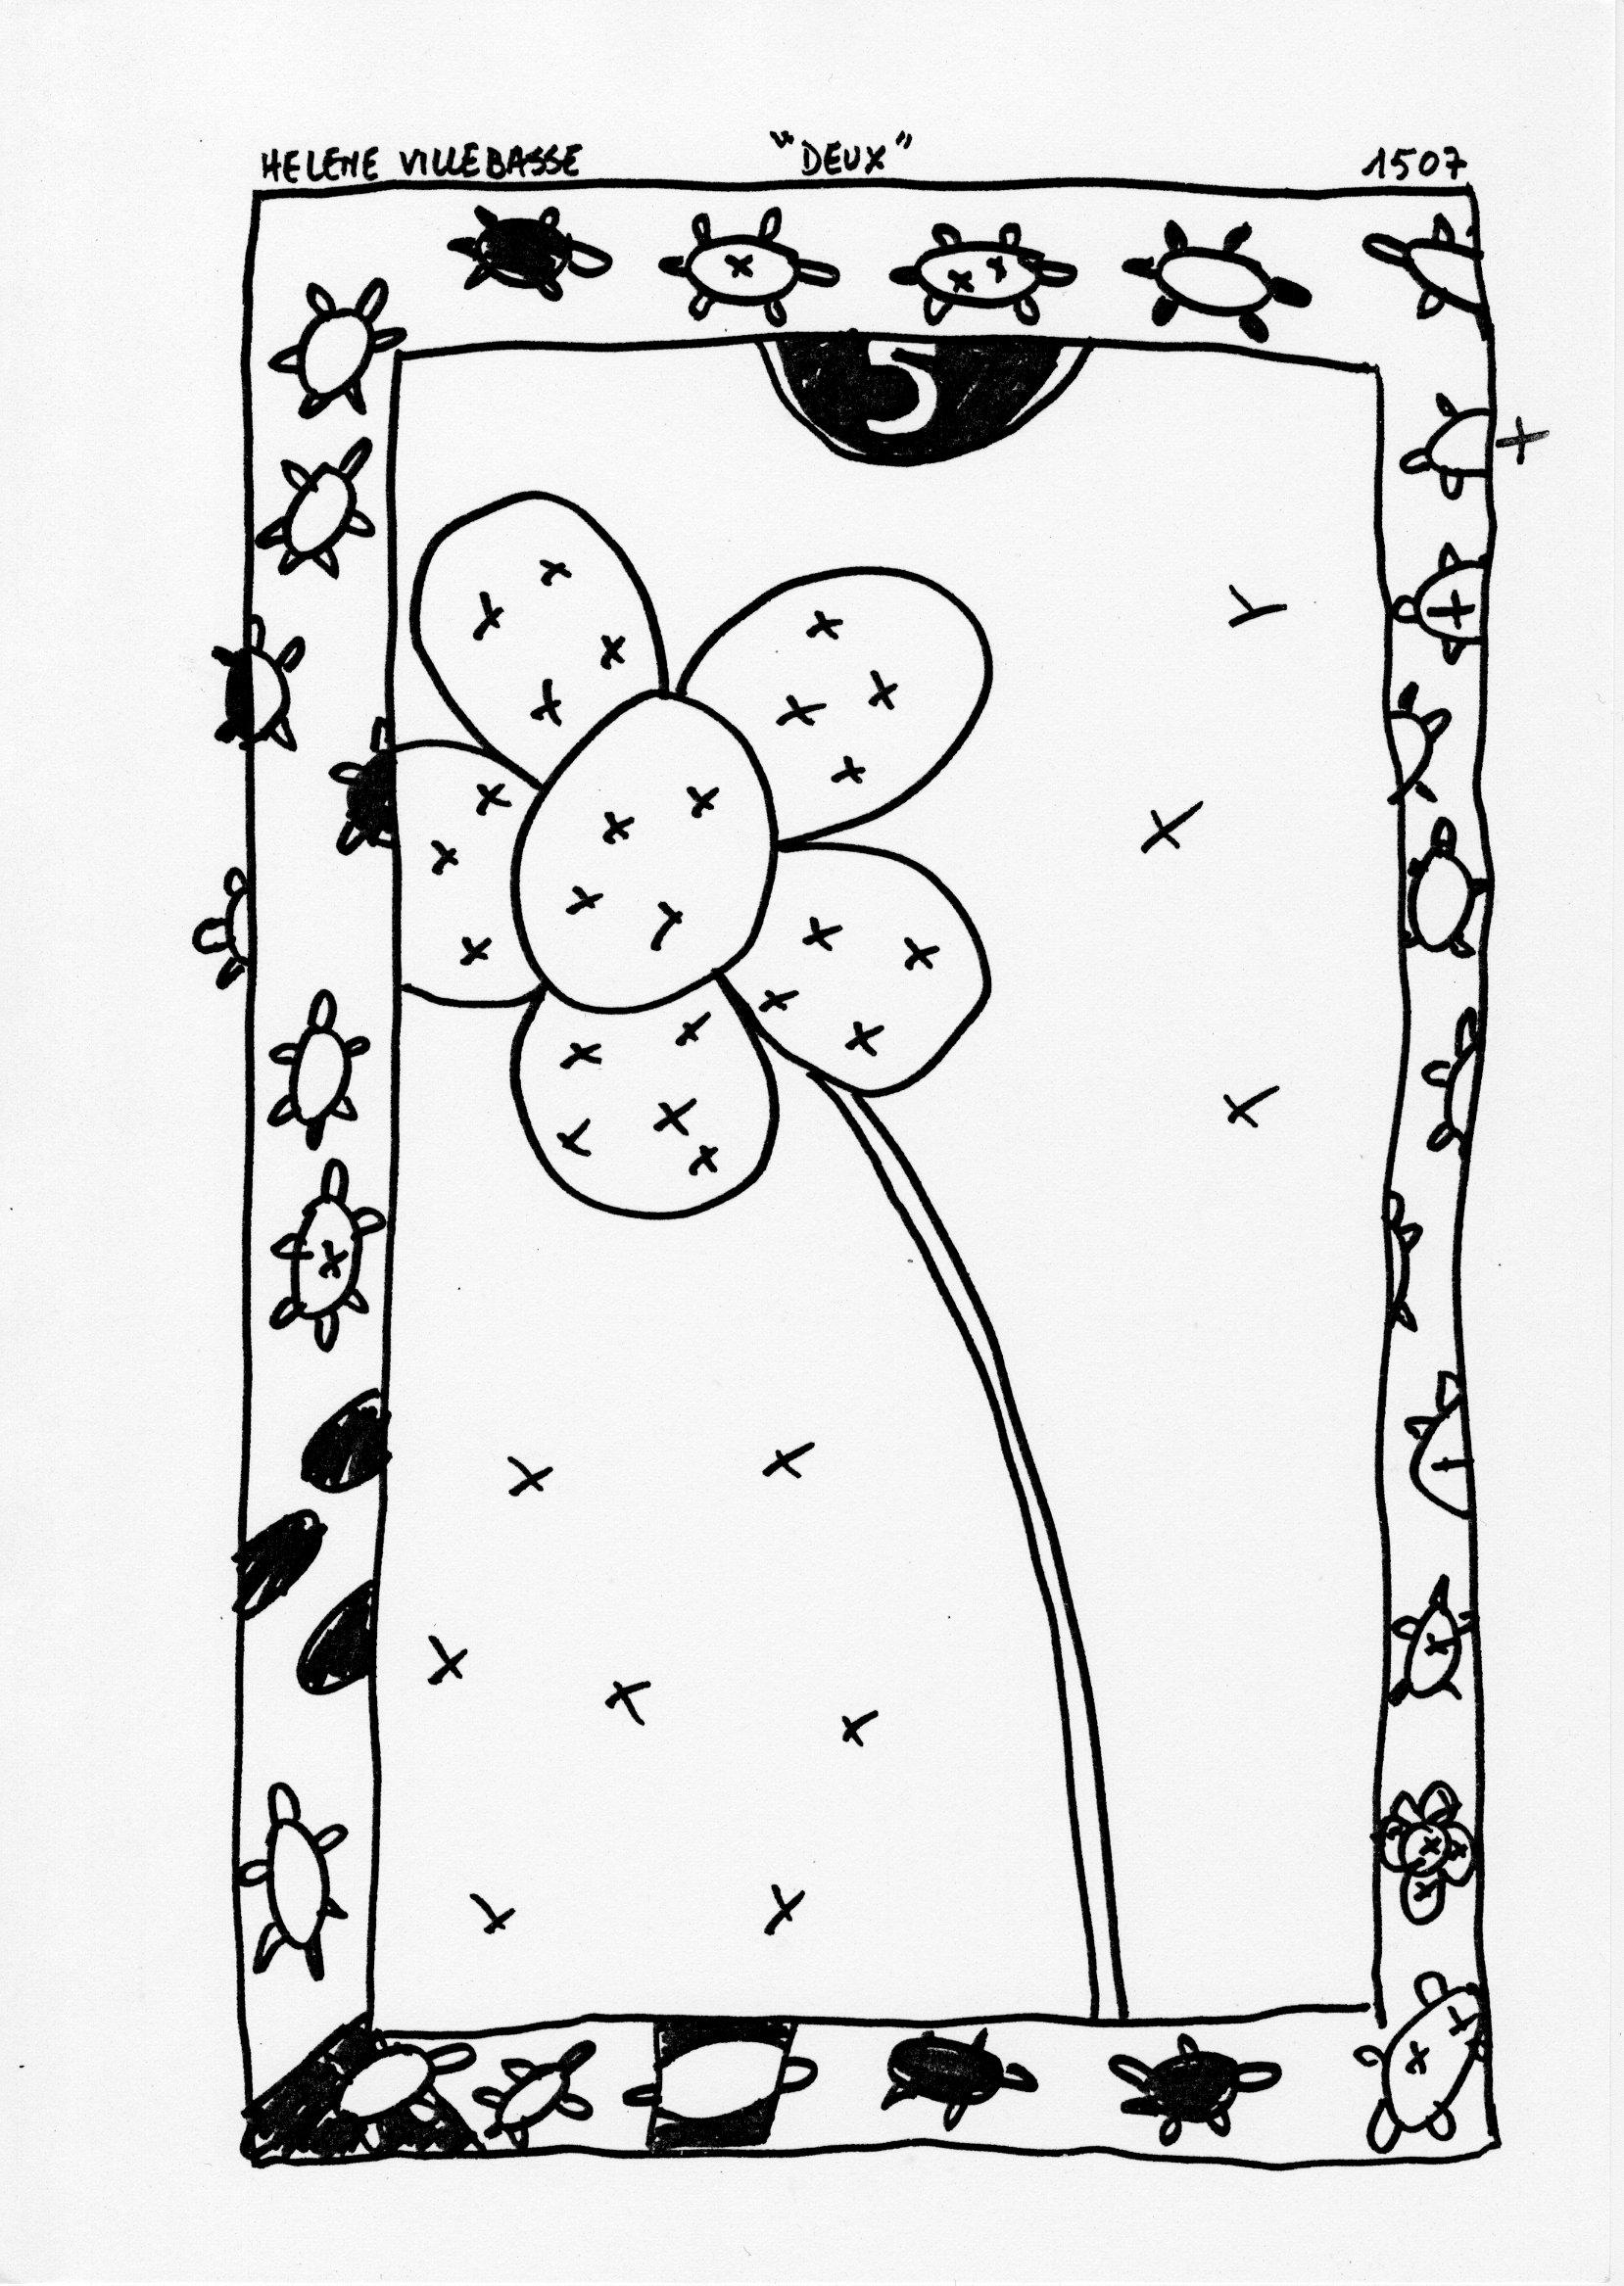 page 1507 H. Villebasse DEUX